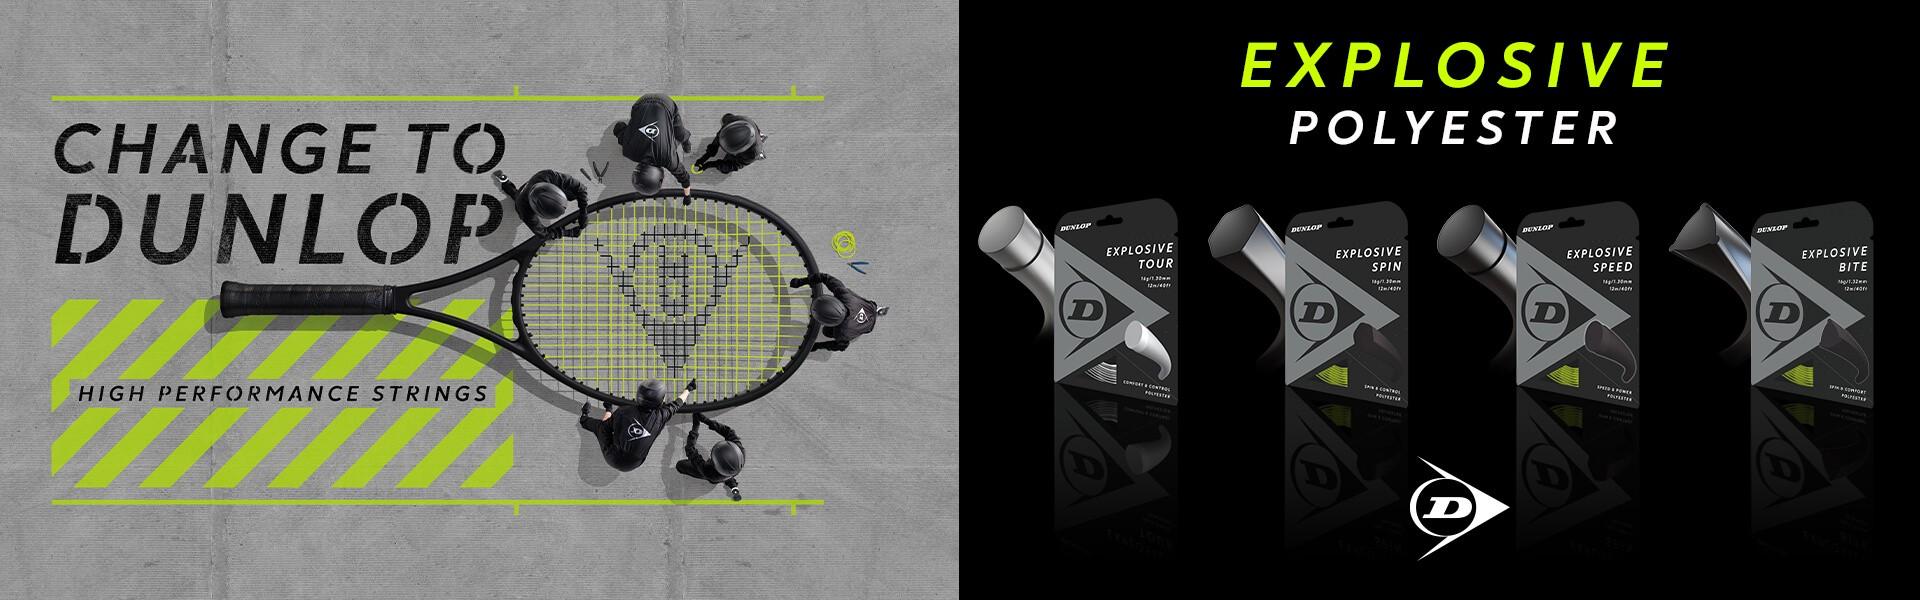 Change to Dunlop High Performance Tennis Strings